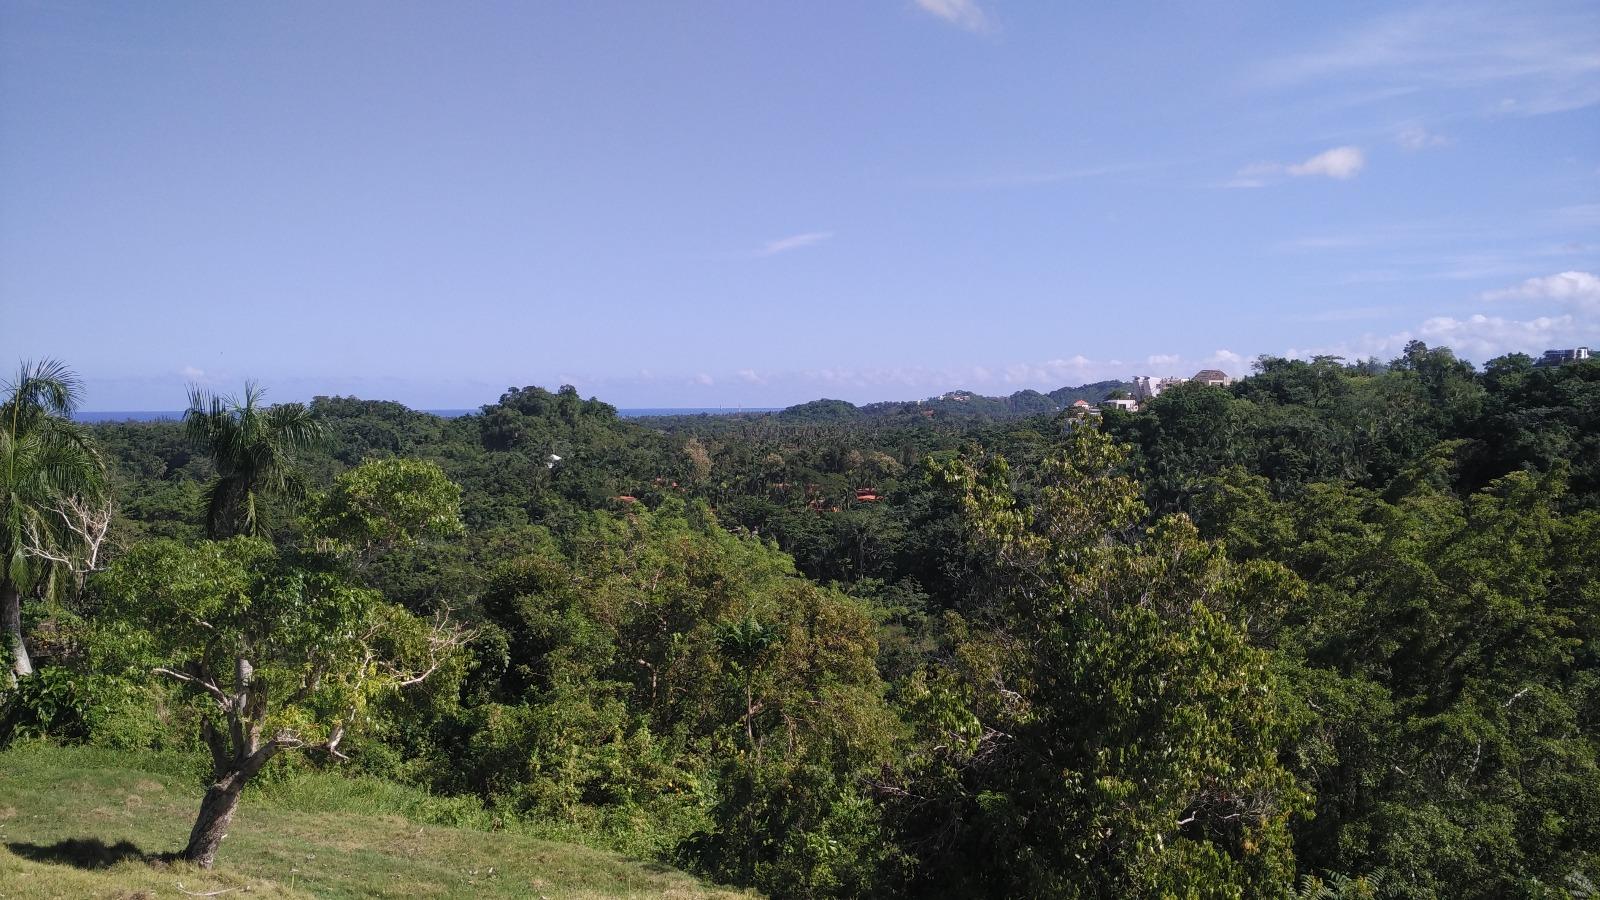 Hill for sale in Las Terrenas Dominican republic 4.jpeg